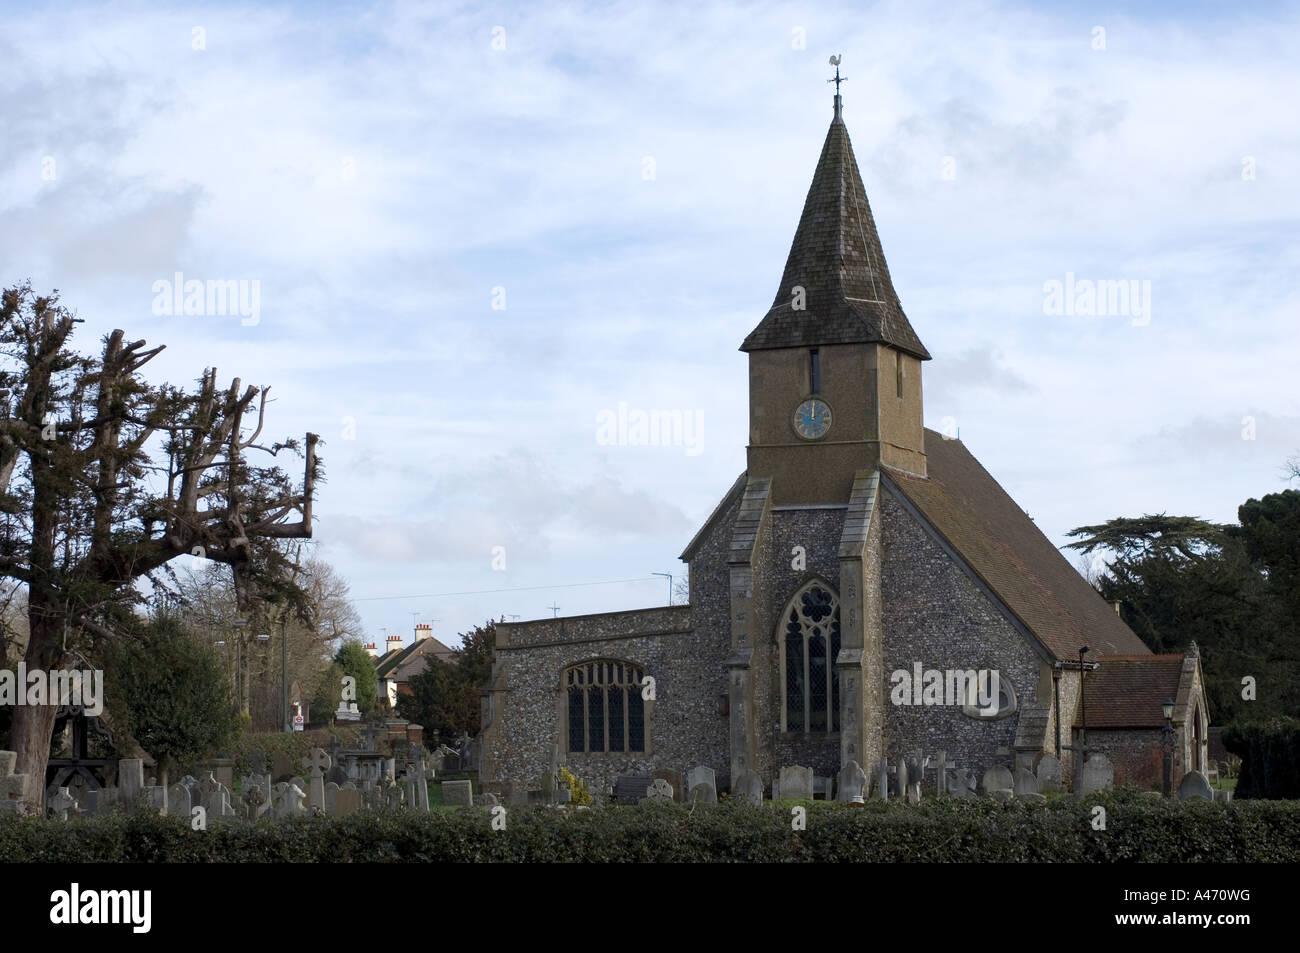 All Saints Church Sanderstead - 1 - Stock Image